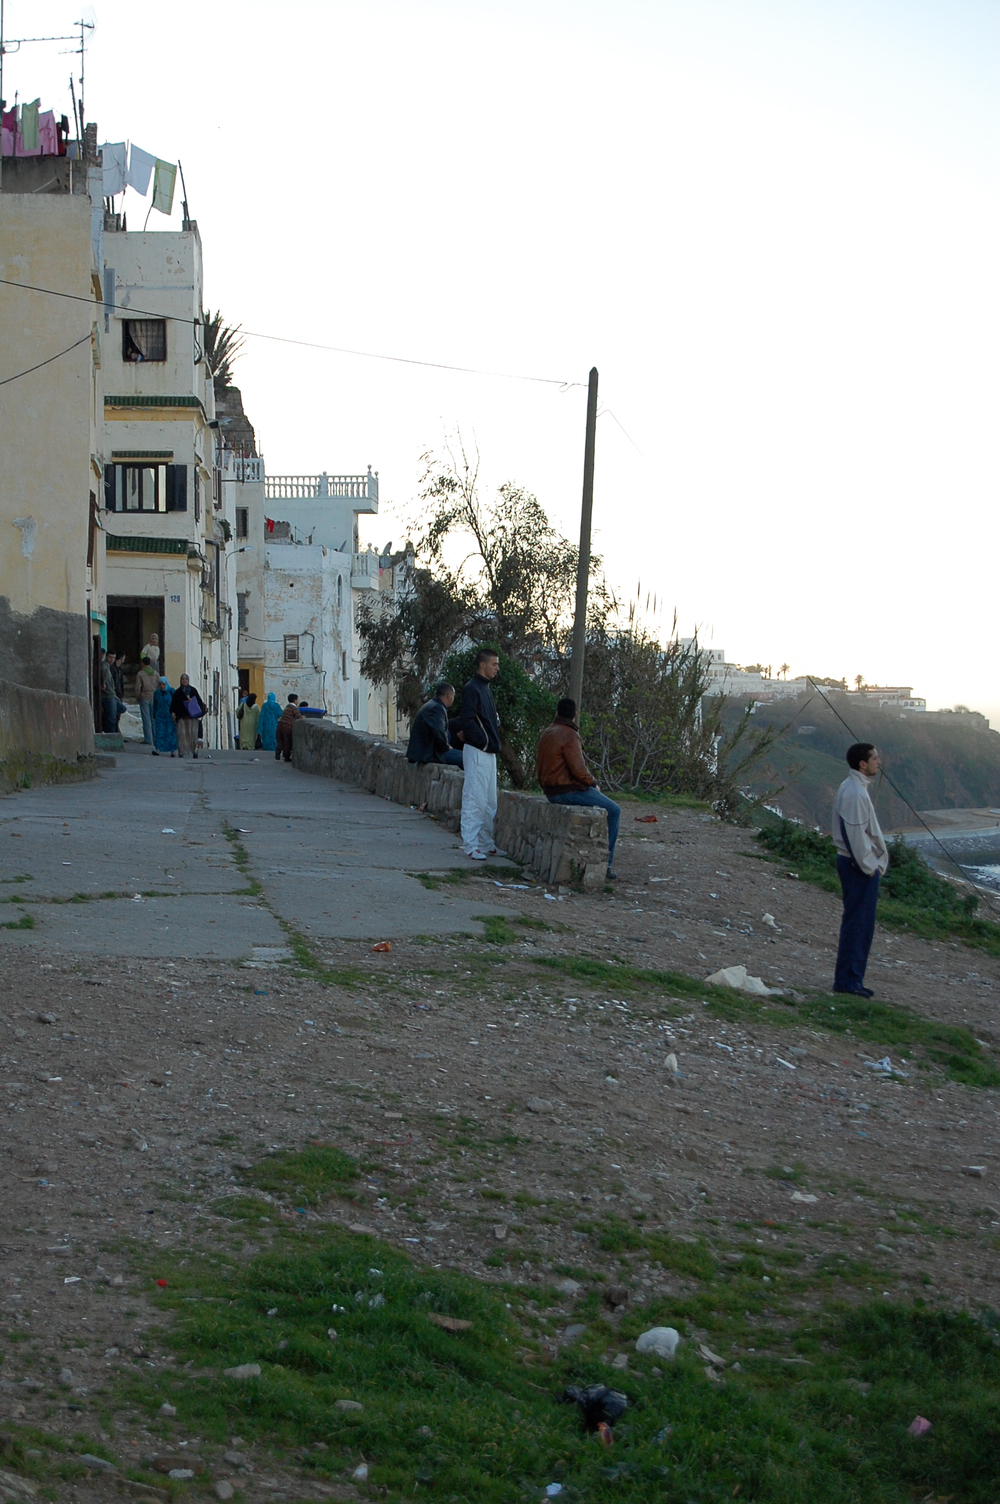 morocco (4 of 39).jpg